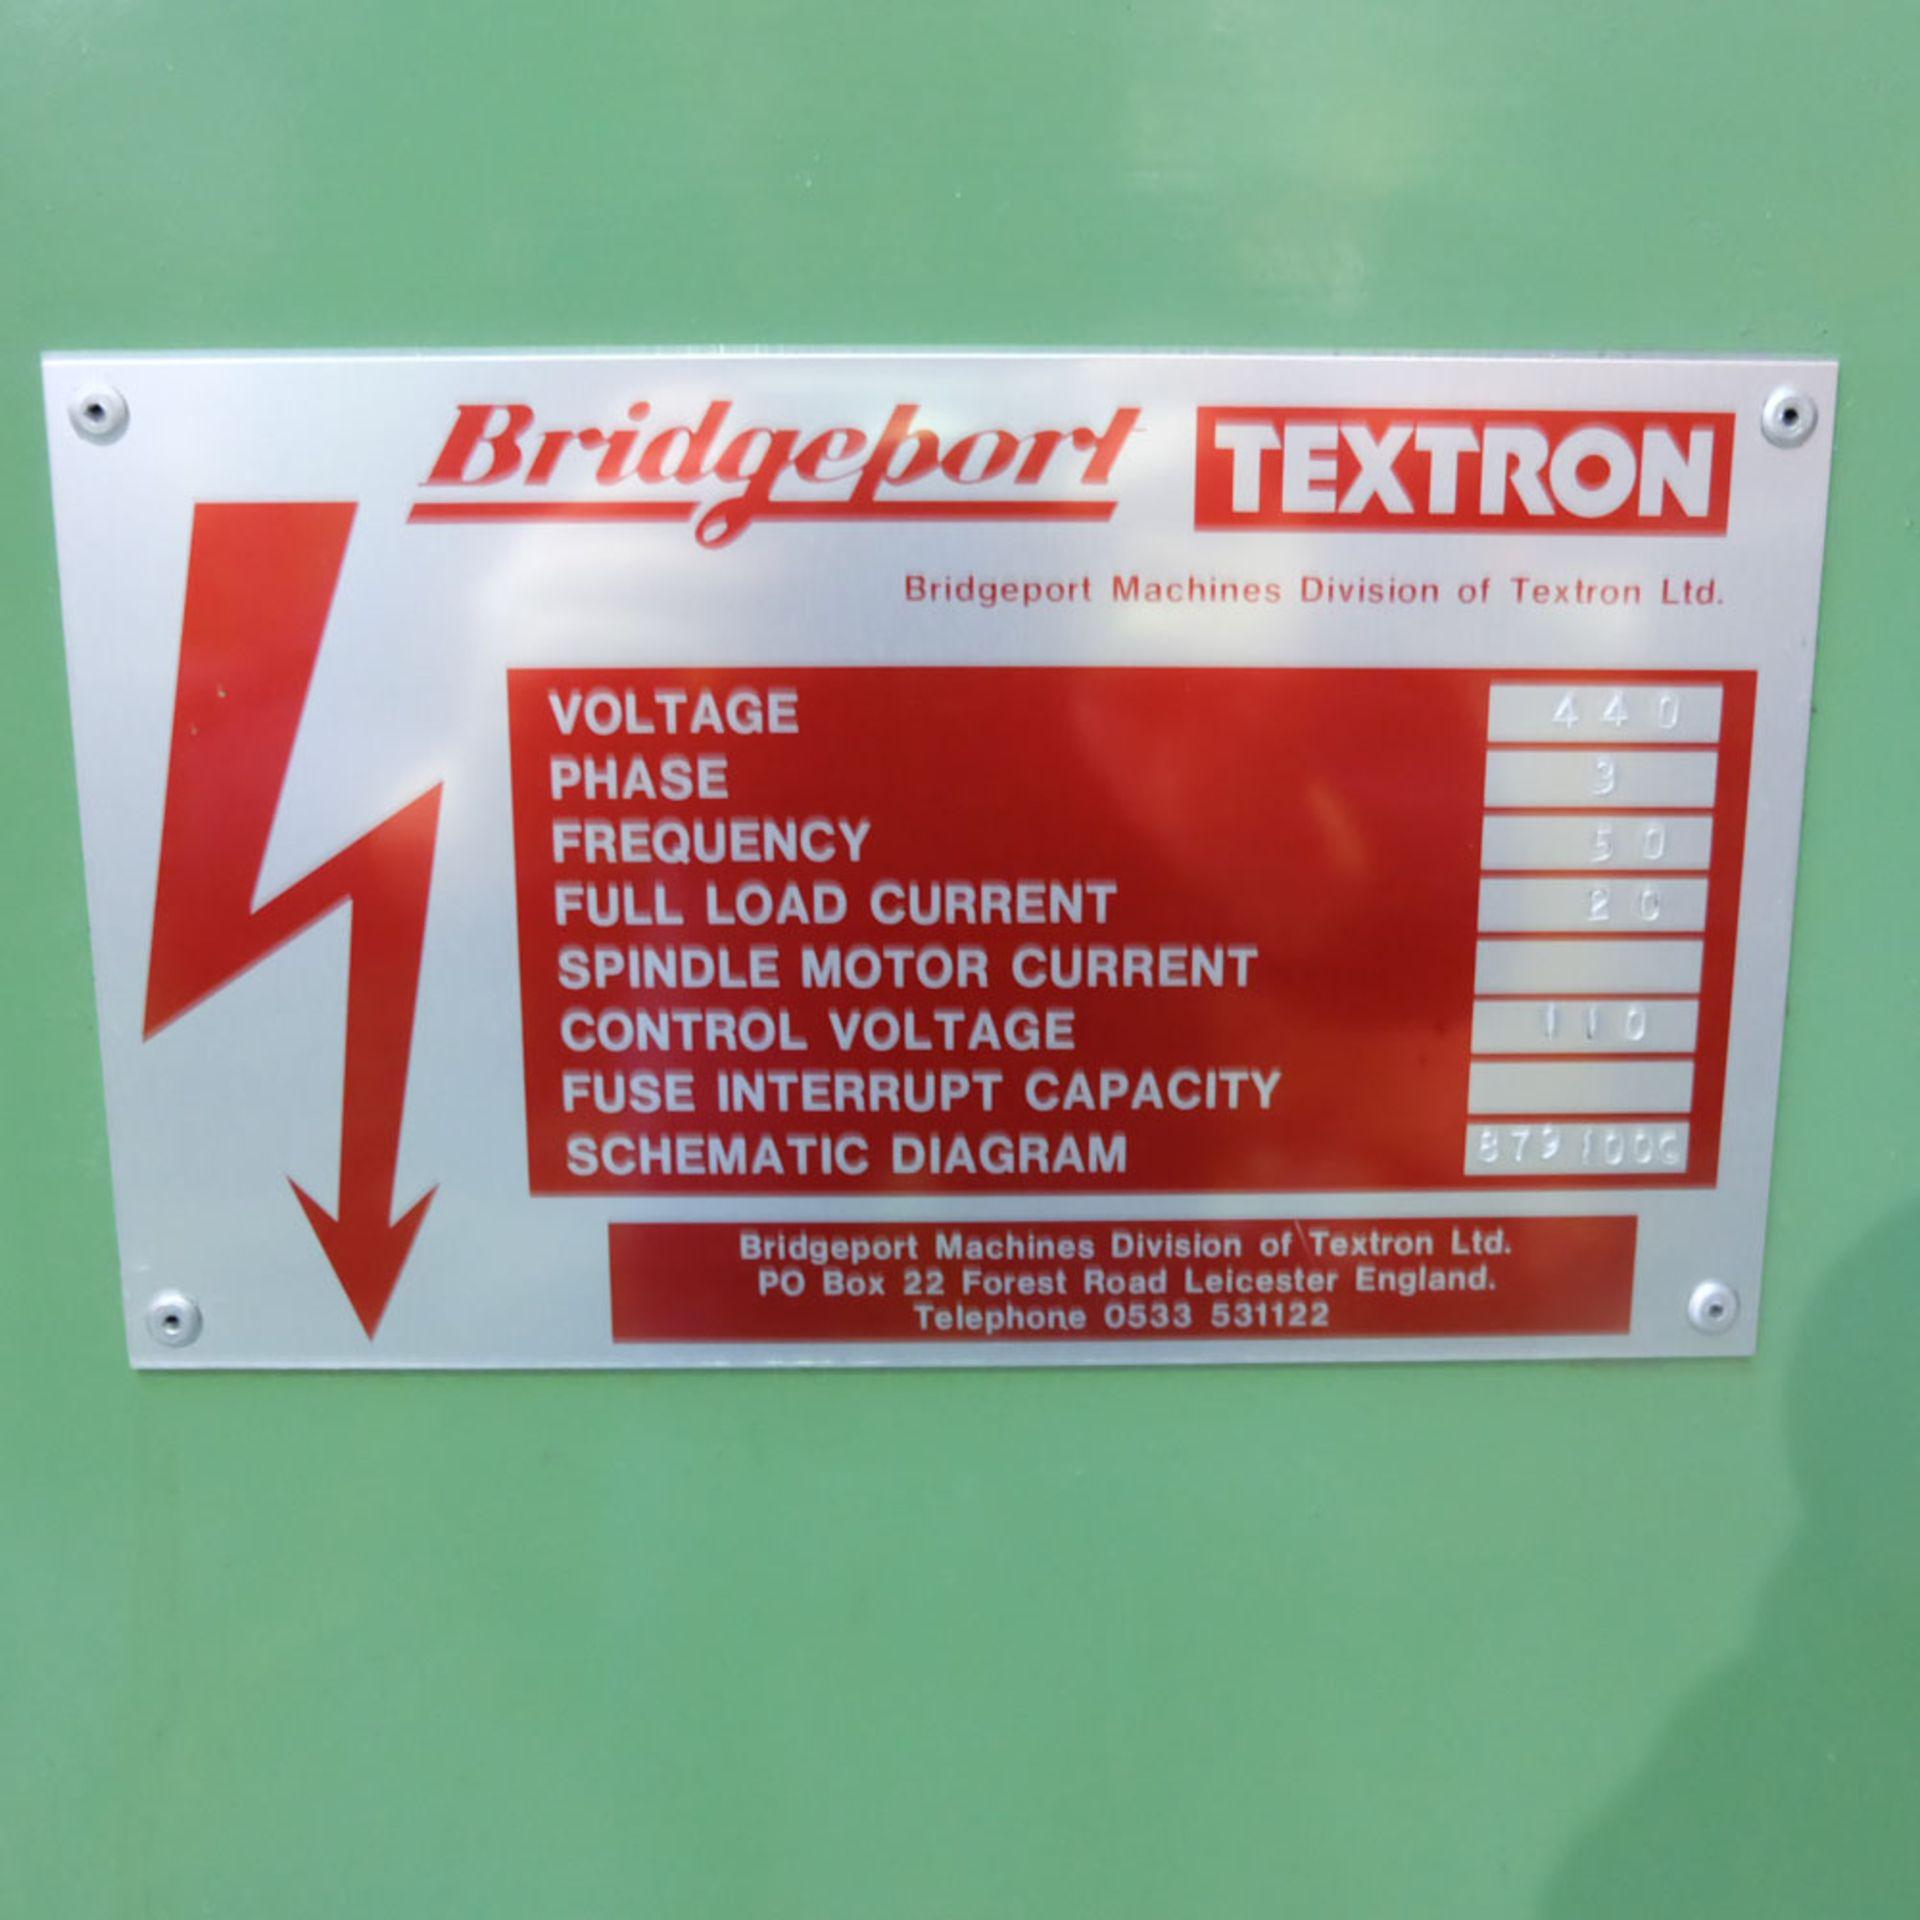 Bridgeport Series 1 MDI. CNC Mill with Heidenhain TNC131 3 Axis Control. - Image 13 of 14